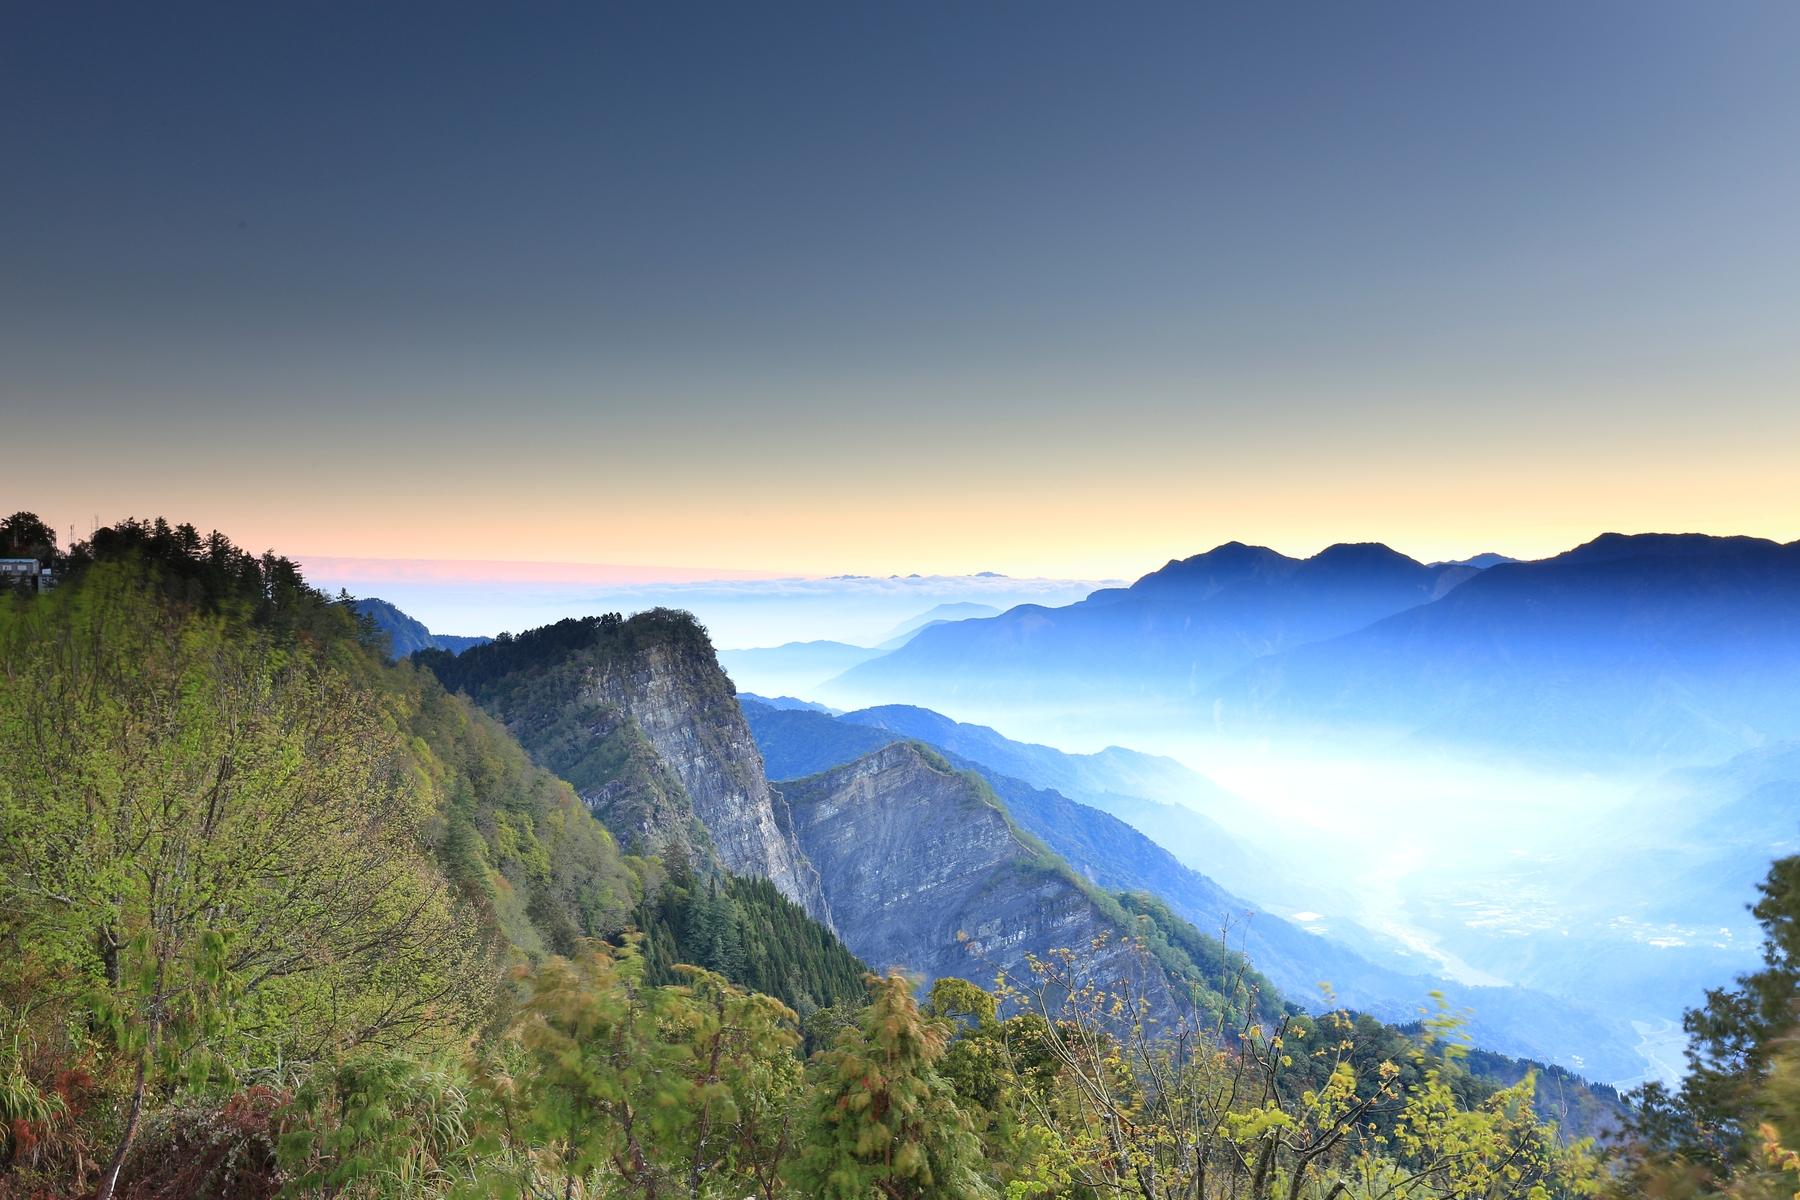 Staycation ideas: Barossa Valley, SA